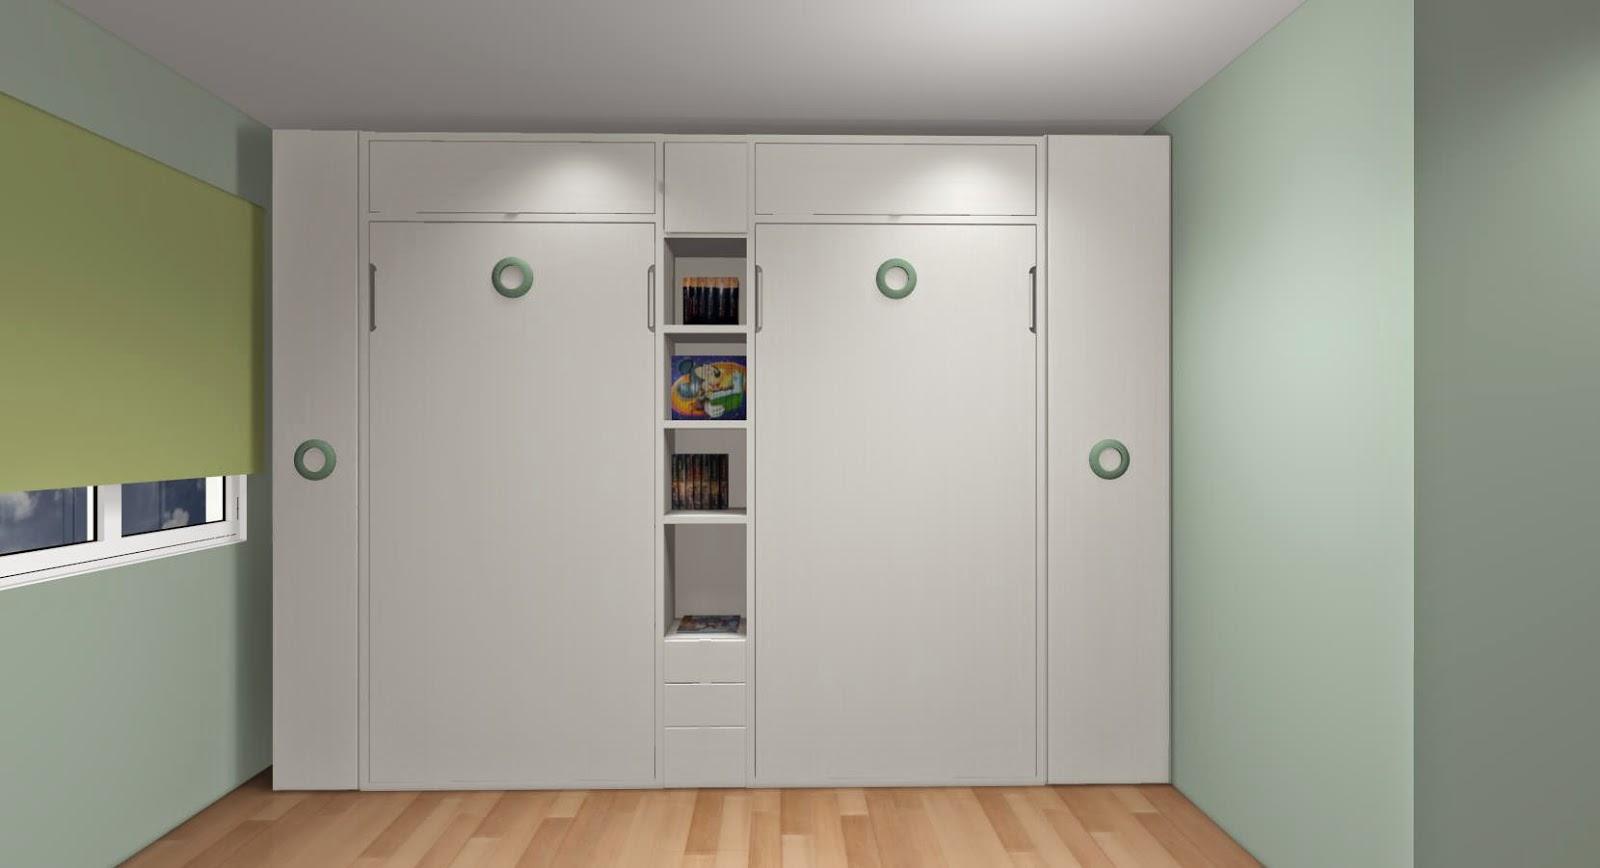 Dise o de cuartos o dormitorios juveniles - Habitaciones dos camas ...